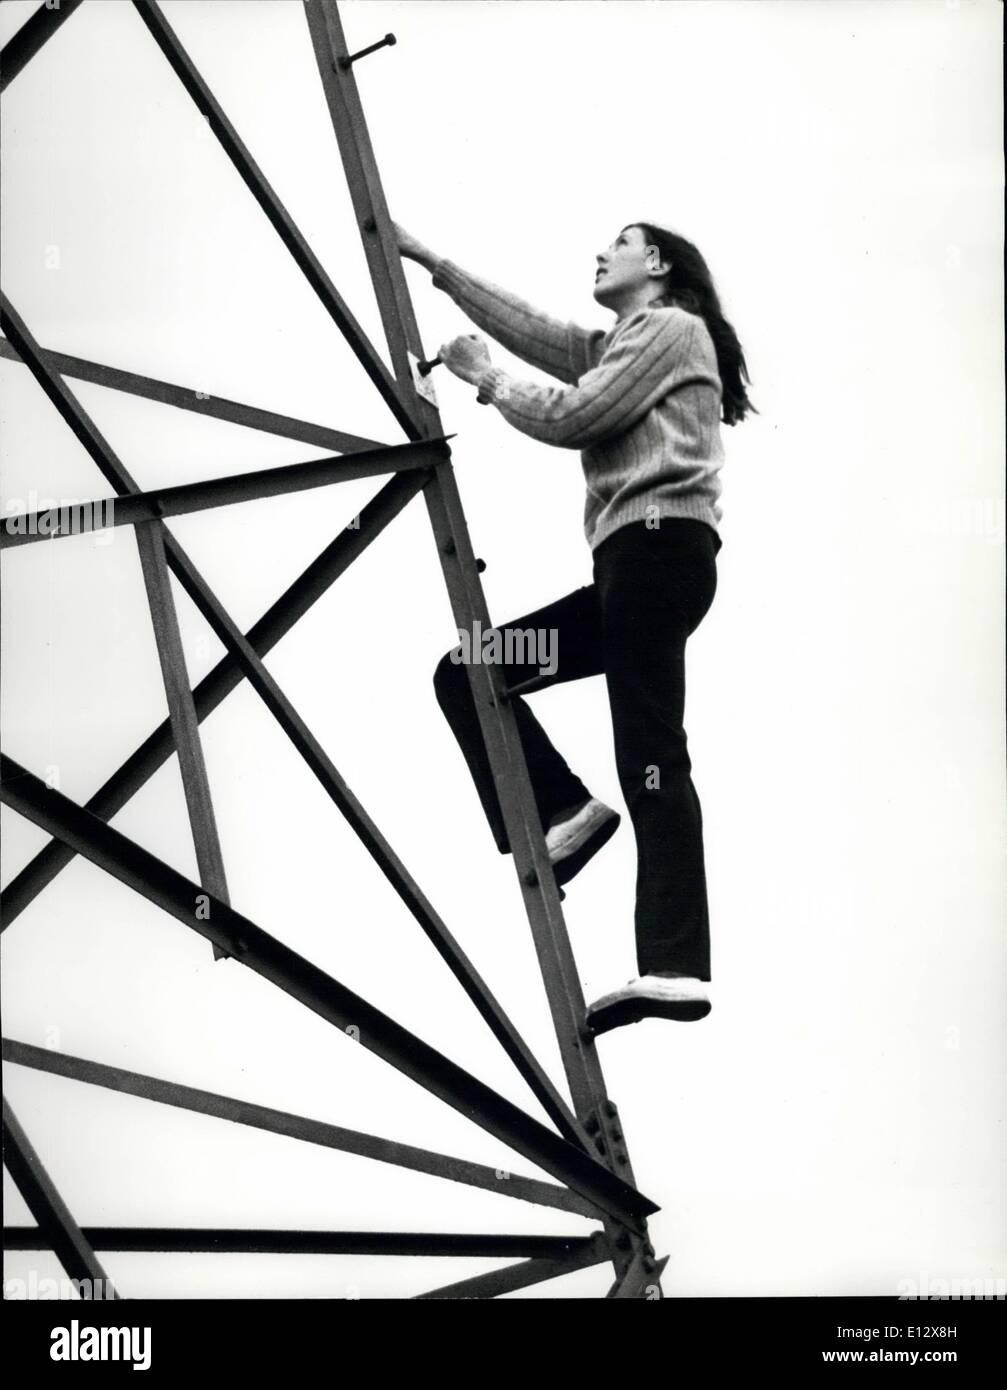 Feb. 25, 2012 - Celia Marr climbs the pylon in the garden - Stock Image